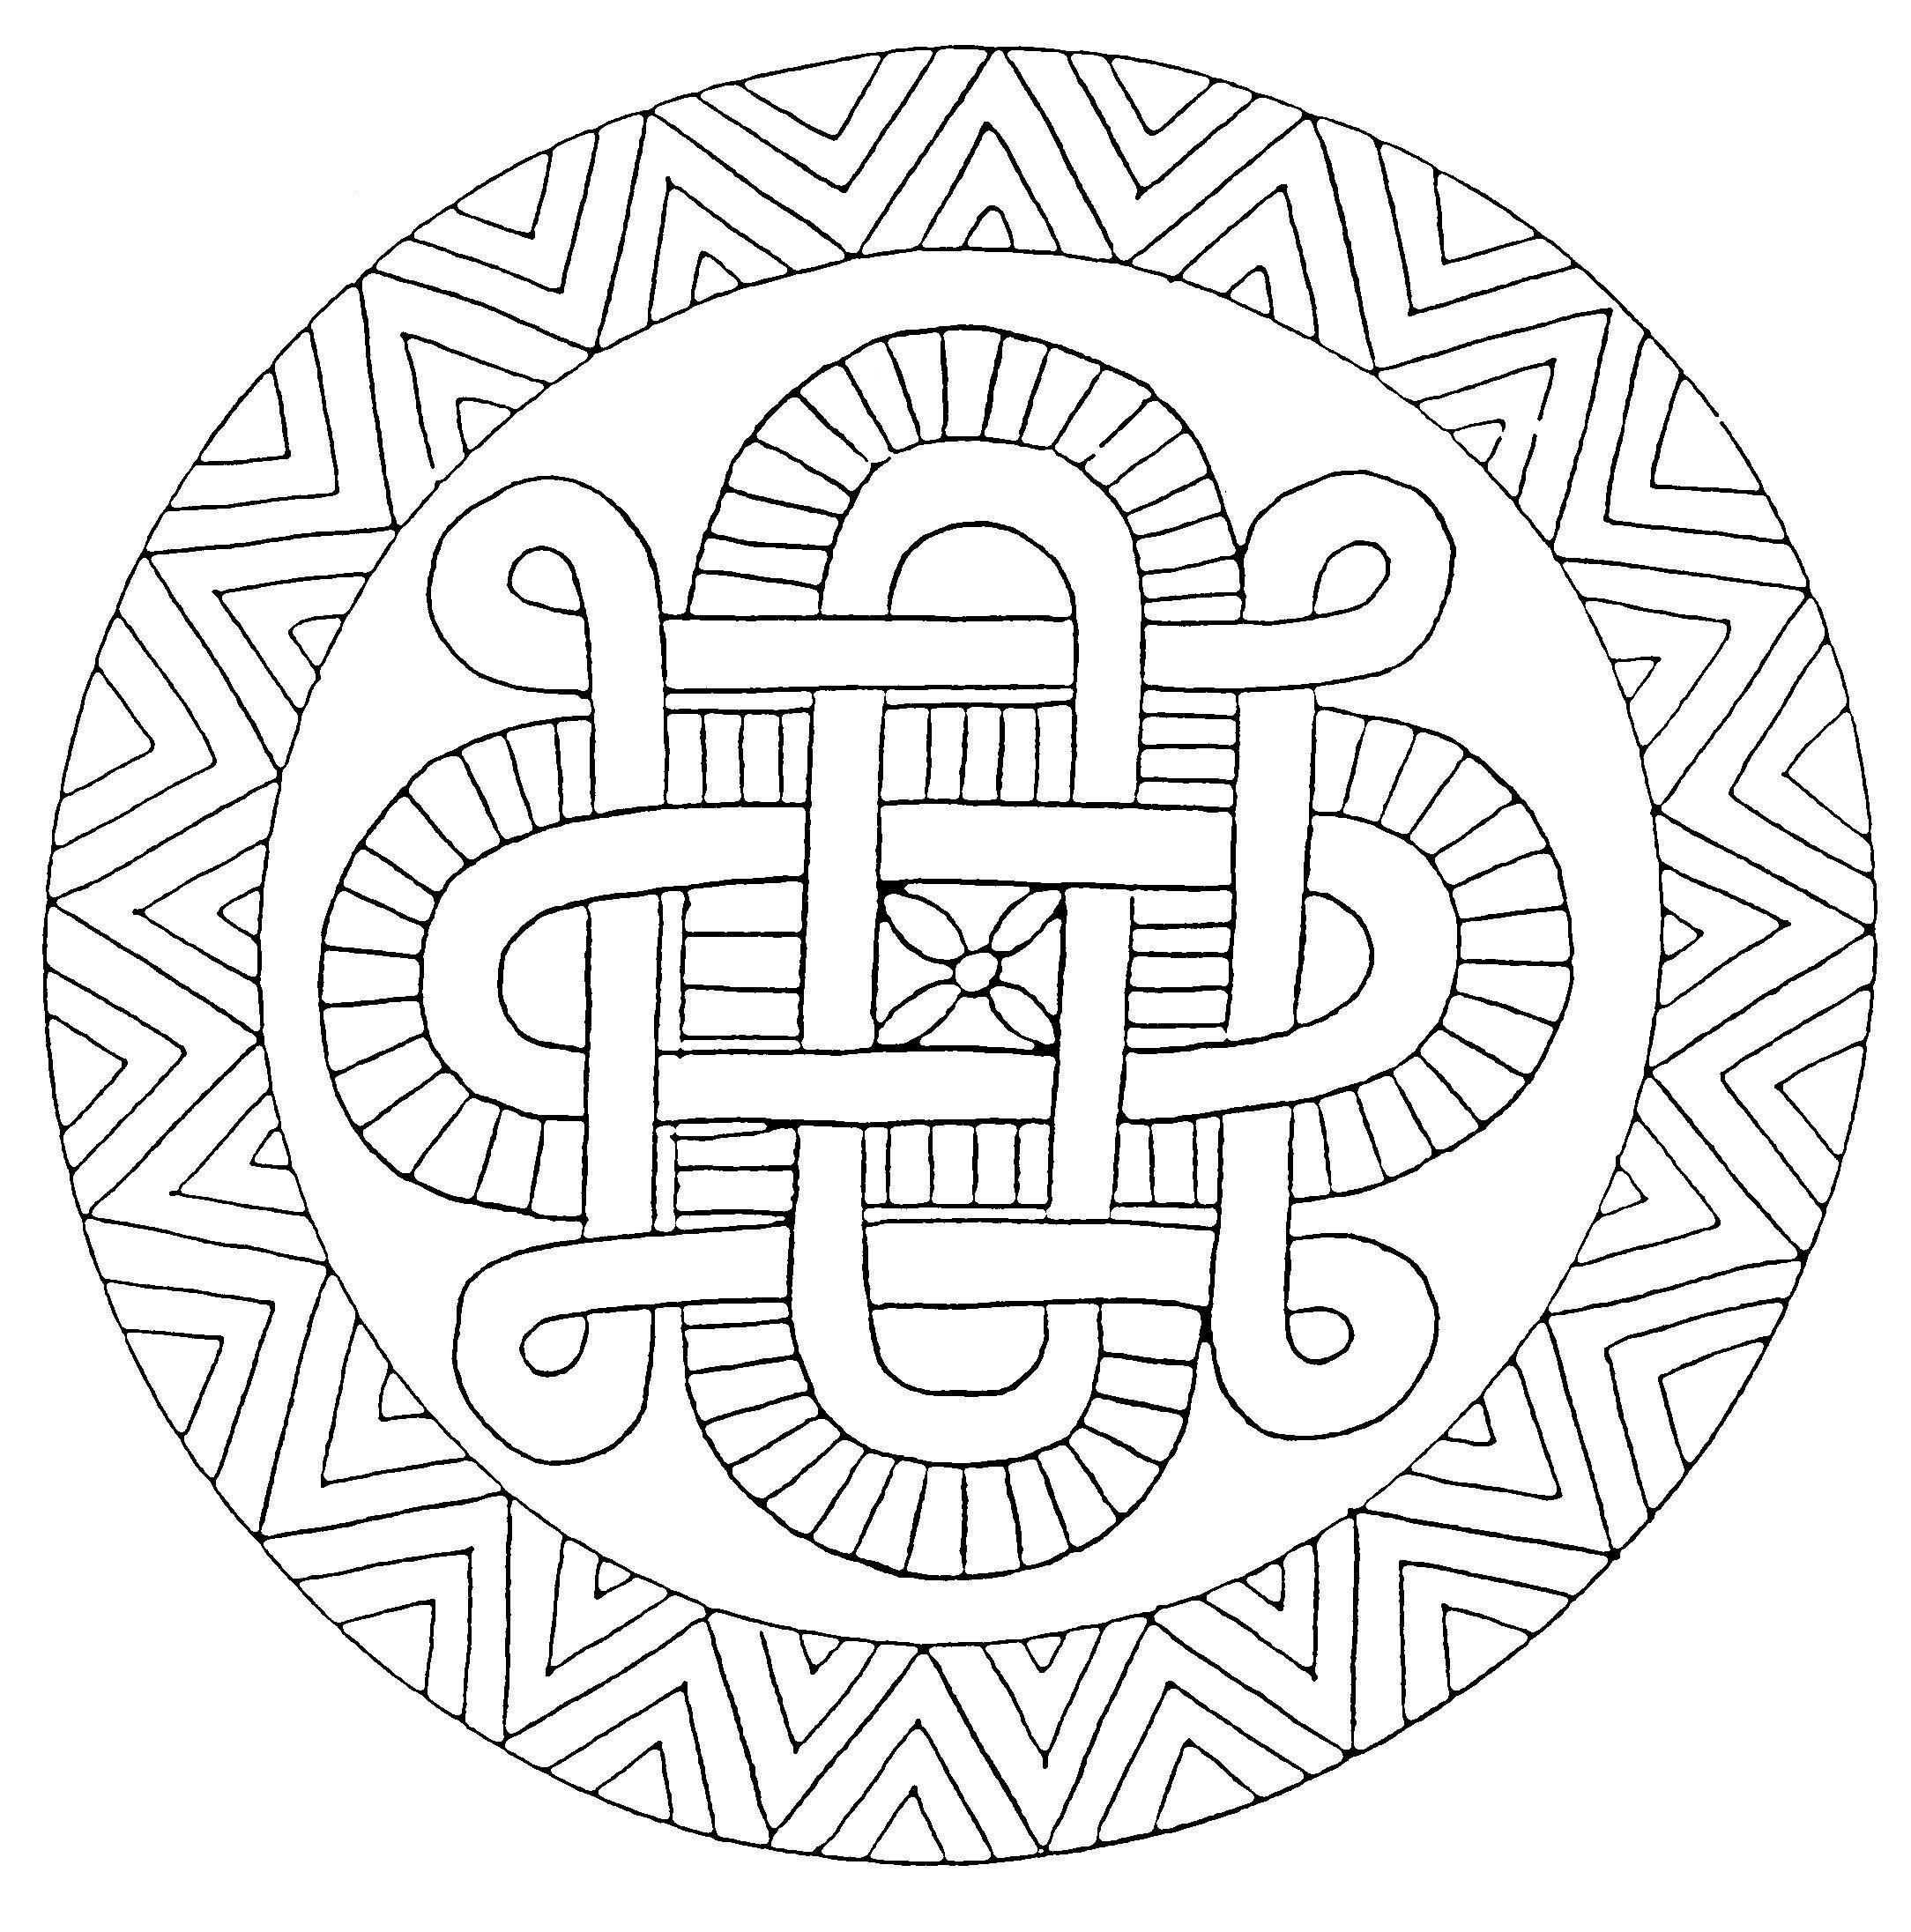 Coloriage mandala et dessin imprimer et colorier - Madala a imprimer ...